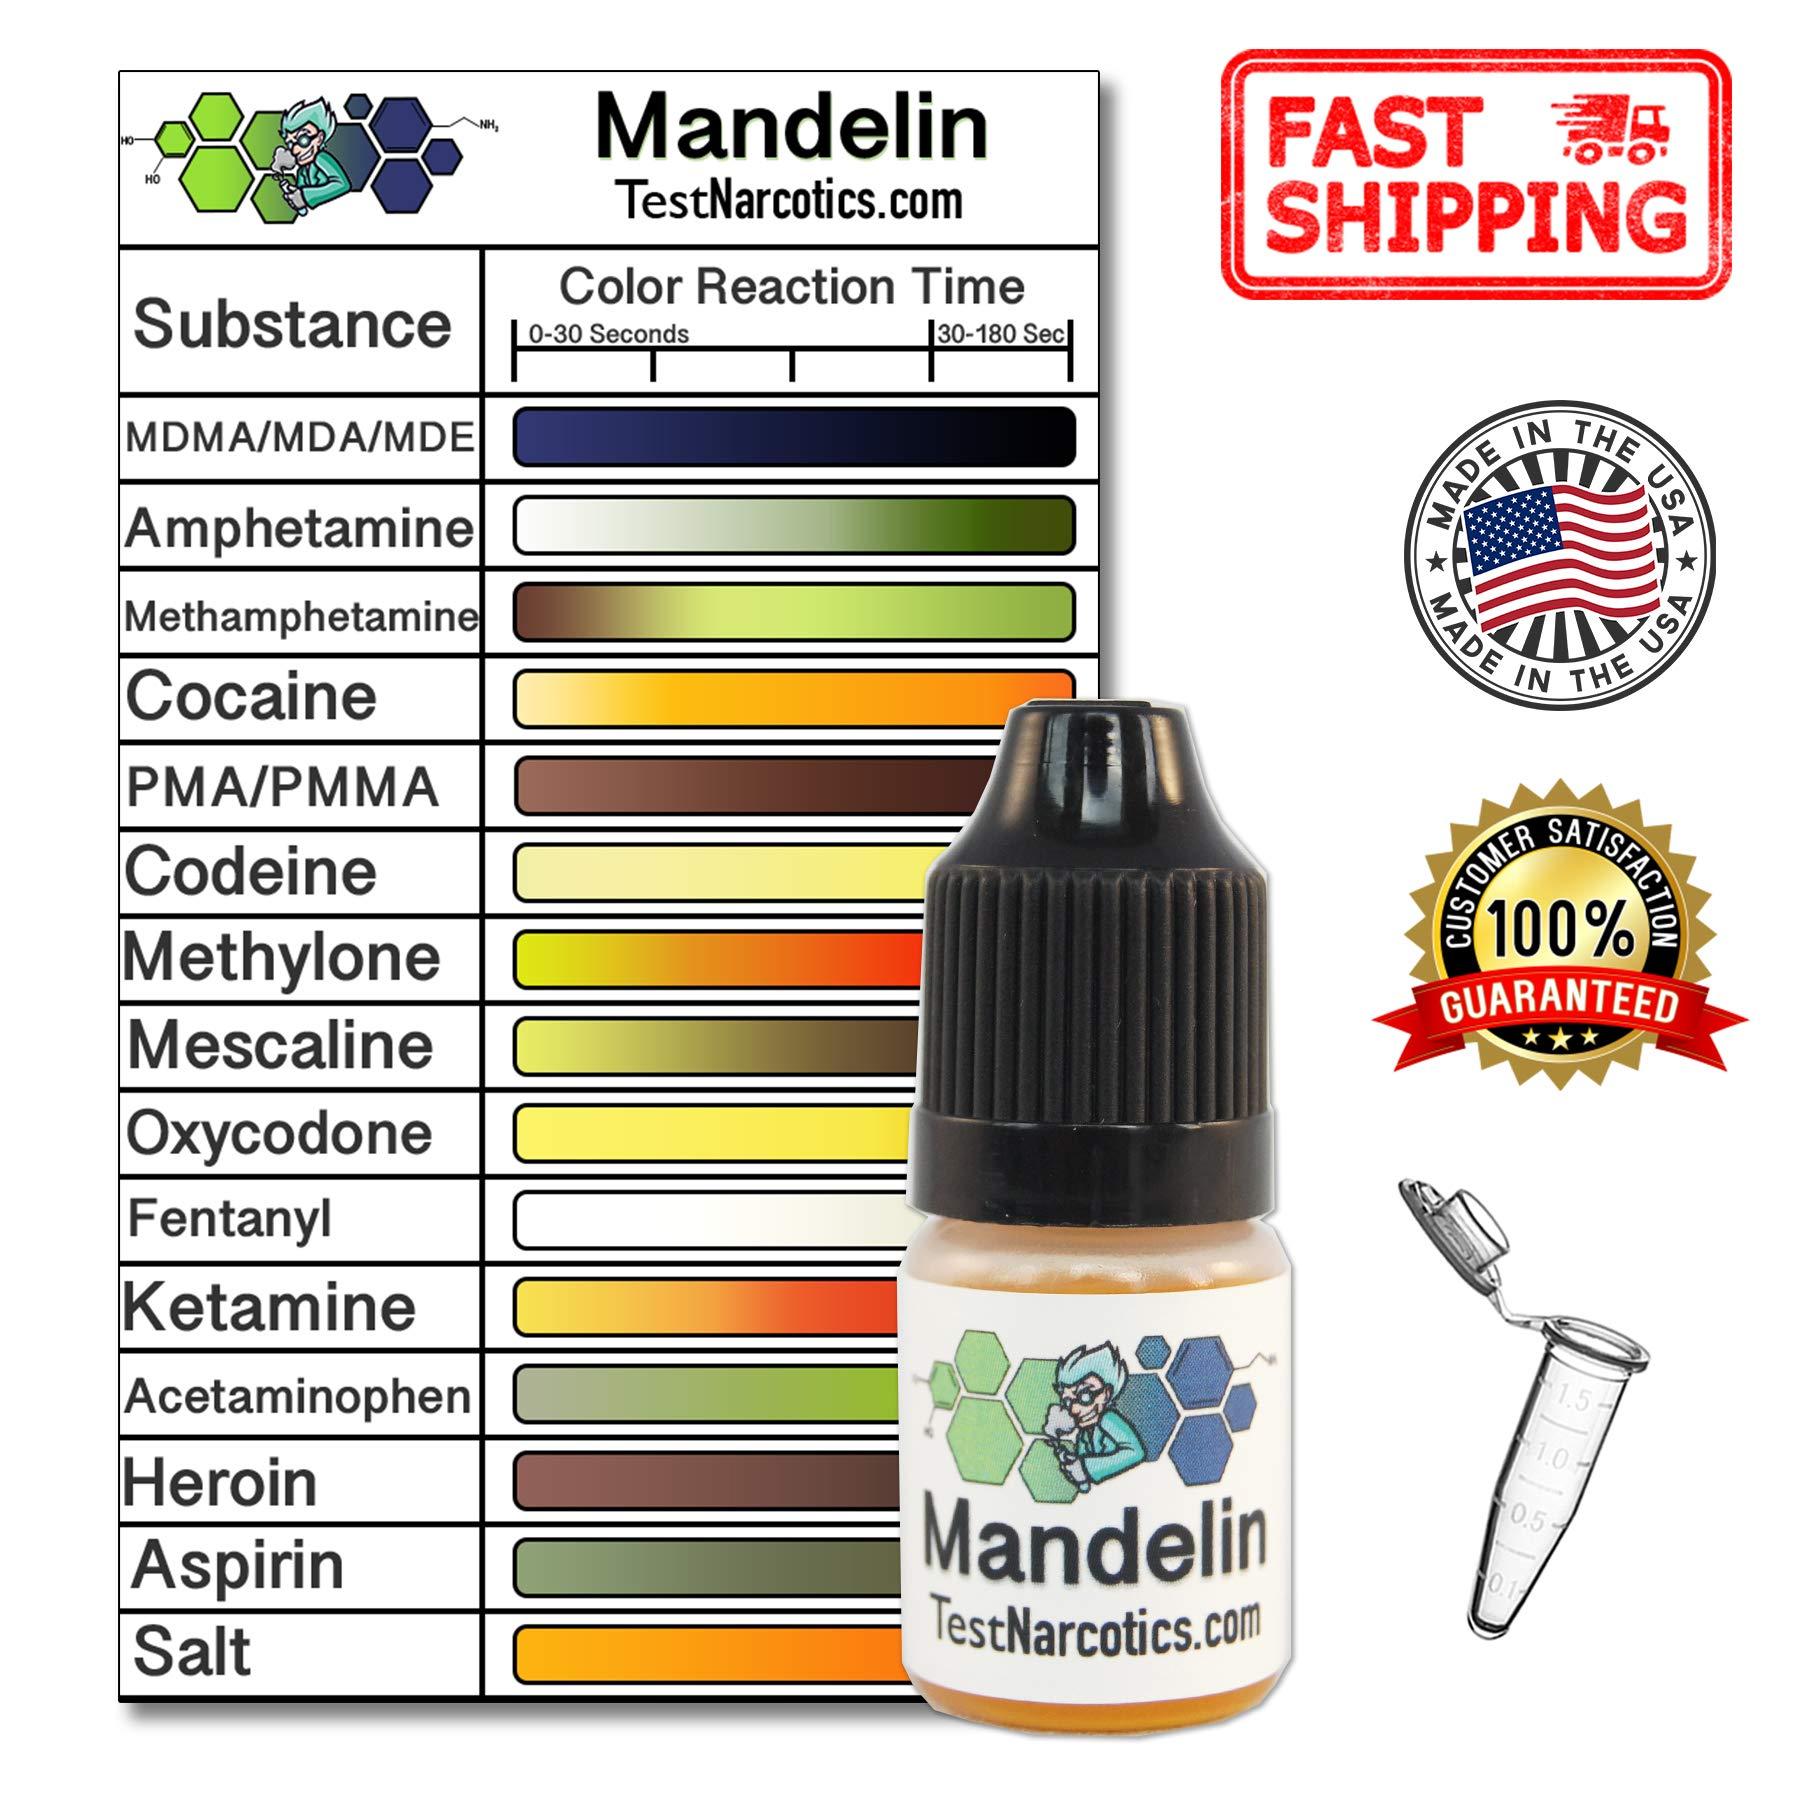 Test Narcotics - Mandelin Reagent Testing Kit | 7ml Bottle for up to 140 Individual Tests